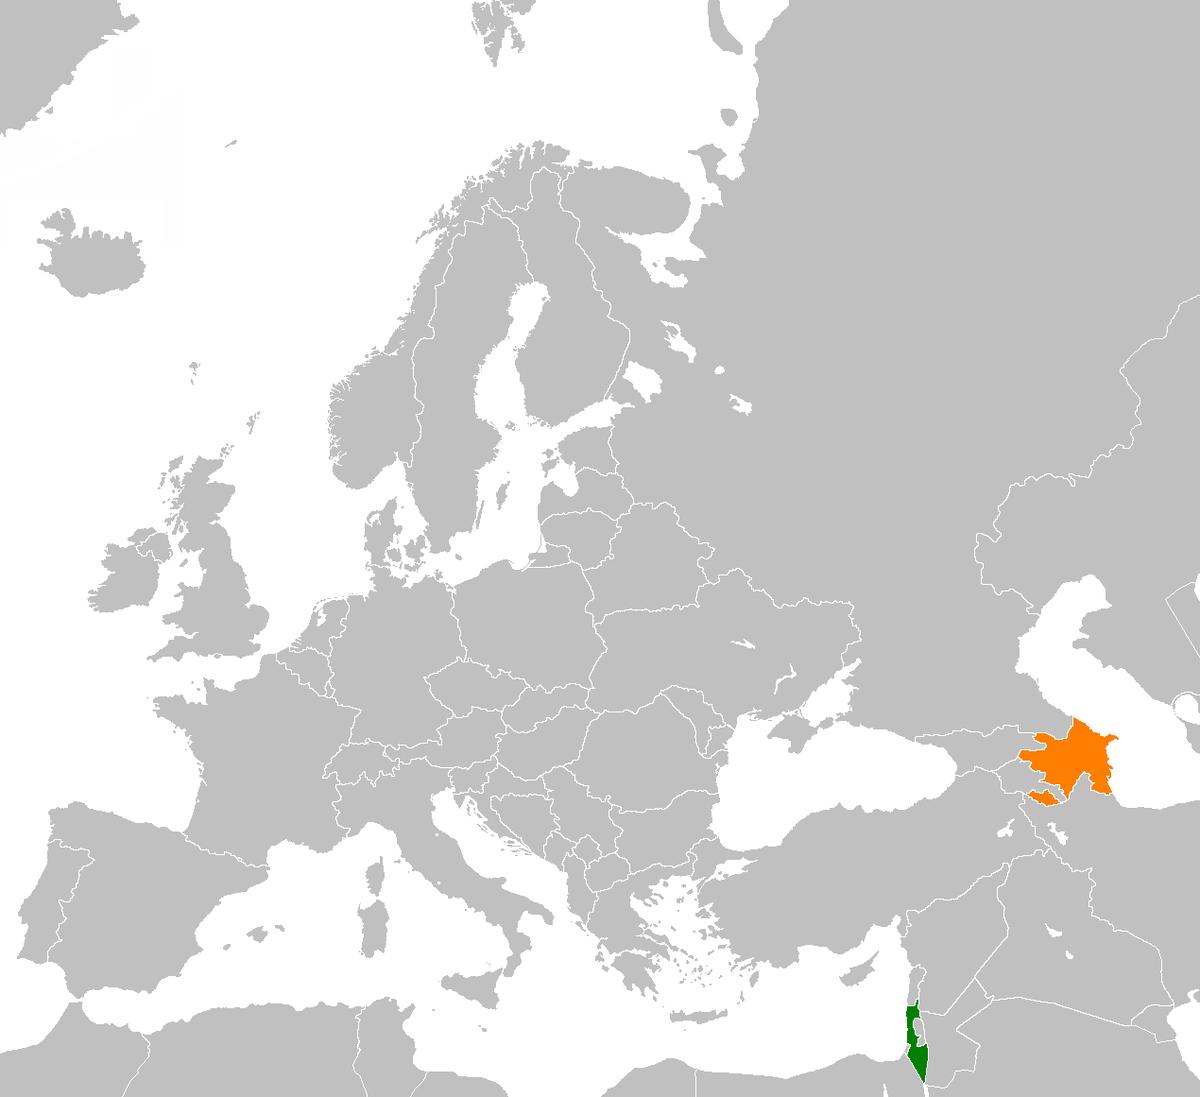 AzerbaijanIsrael relations Wikipedia